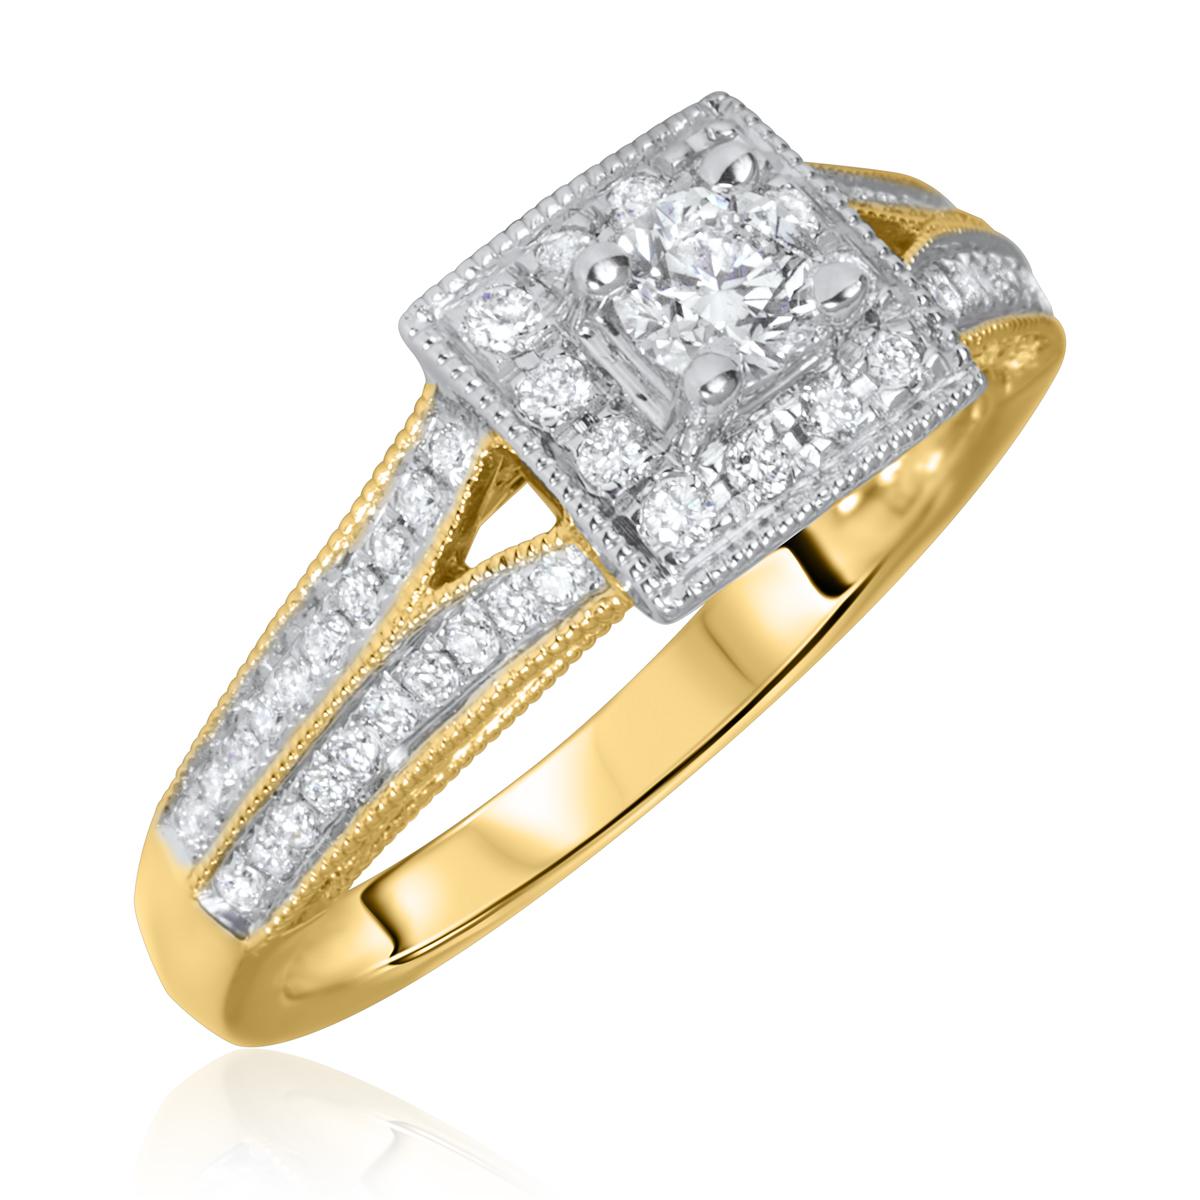 7/8 Carat T.W. Round Cut Diamond Ladies Engagement Ring 10K Yellow Gold- Size 8